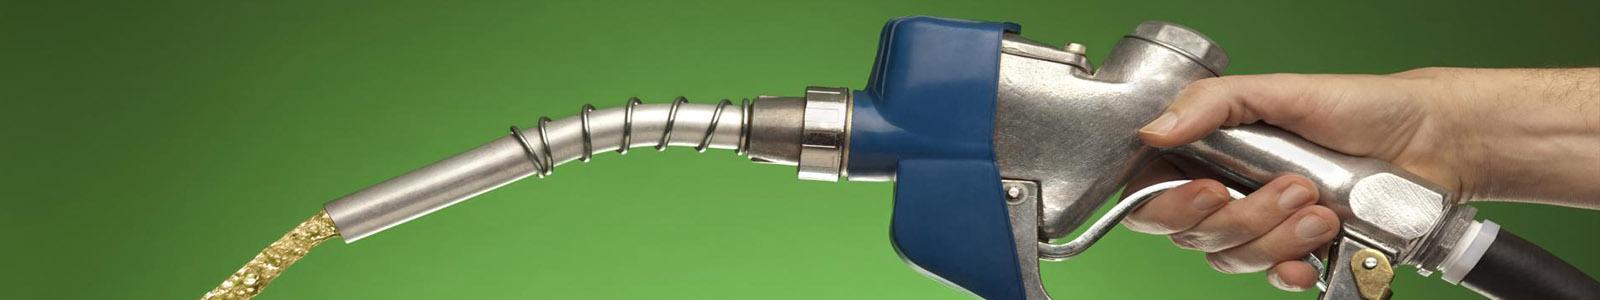 Gasoline 1